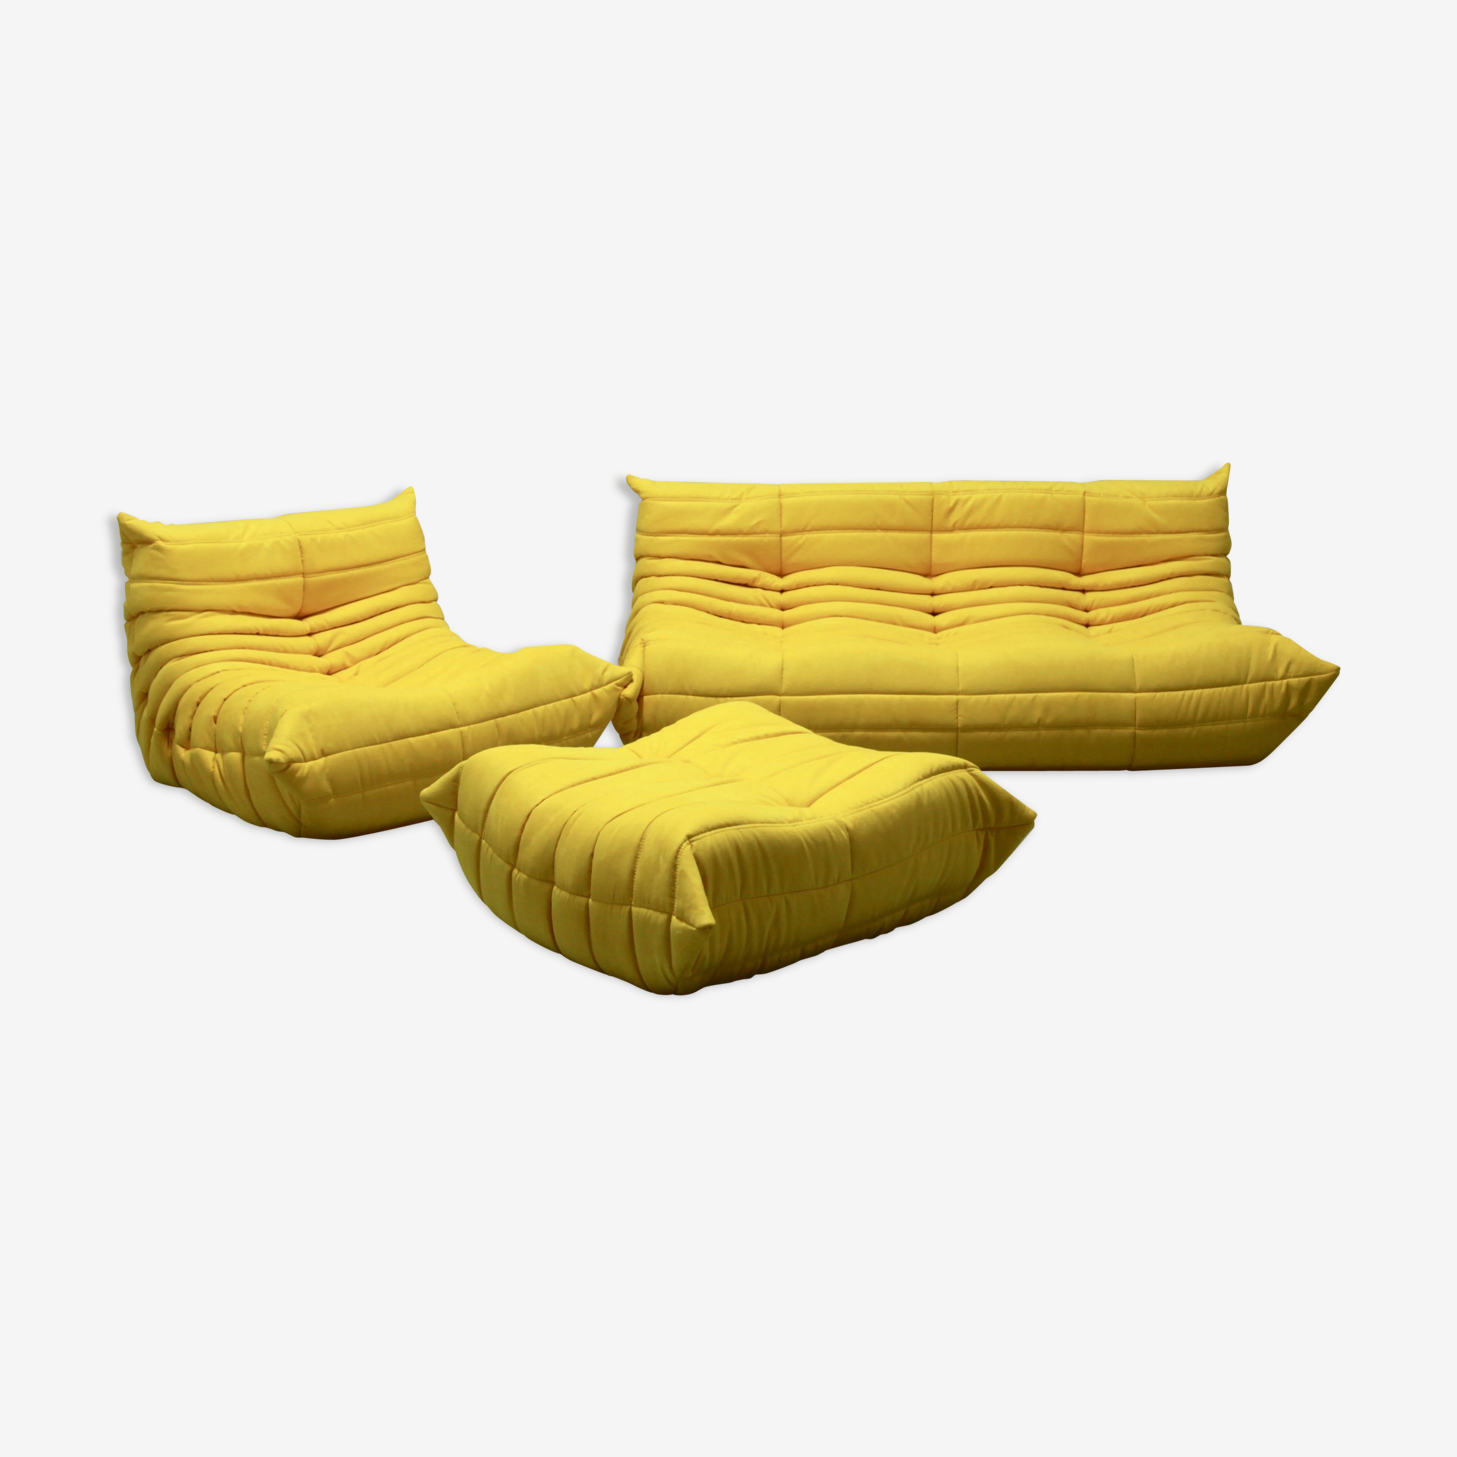 """Togo"" sofa set in Microfiber by Michel Ducaroy for Ligne Roset"